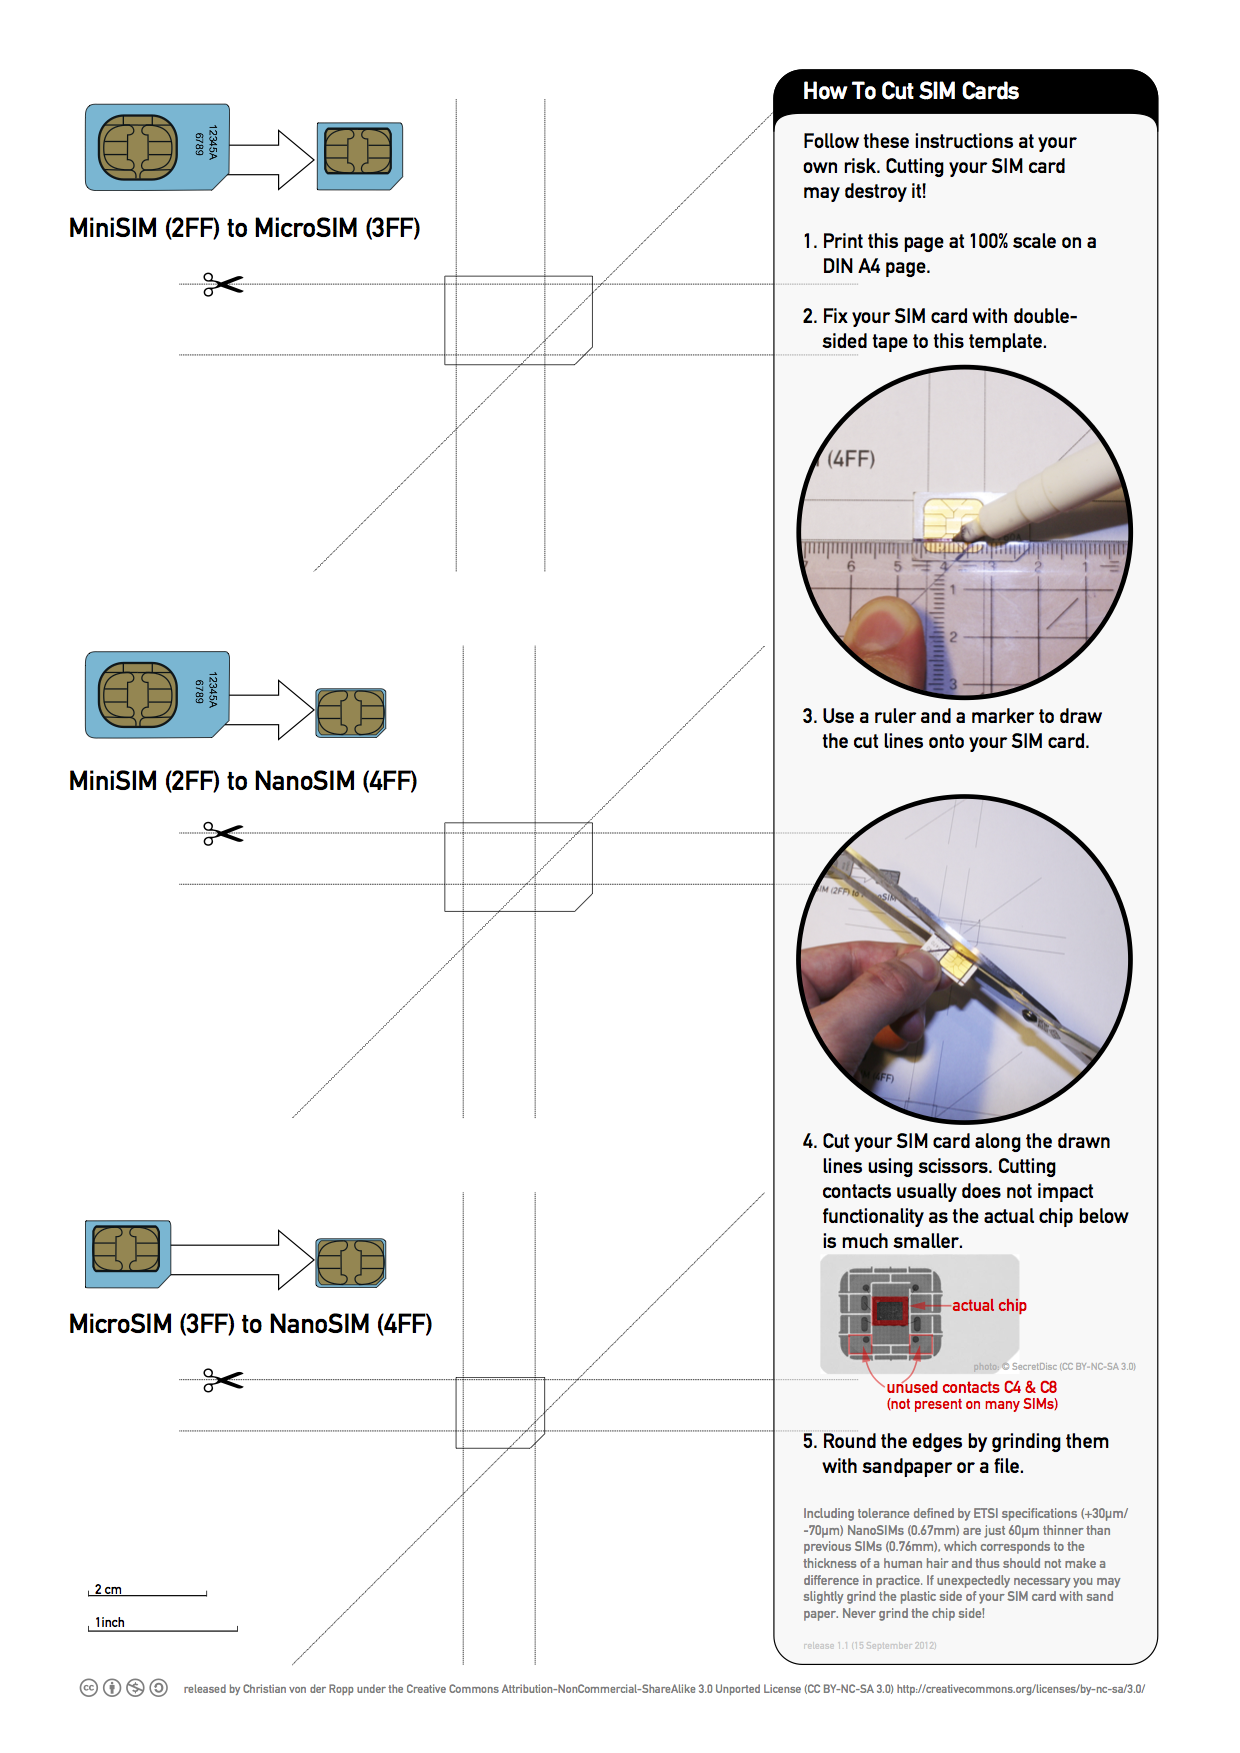 Printable Nano SIM and Micro SIM Cutting Guide [Download] iClarified